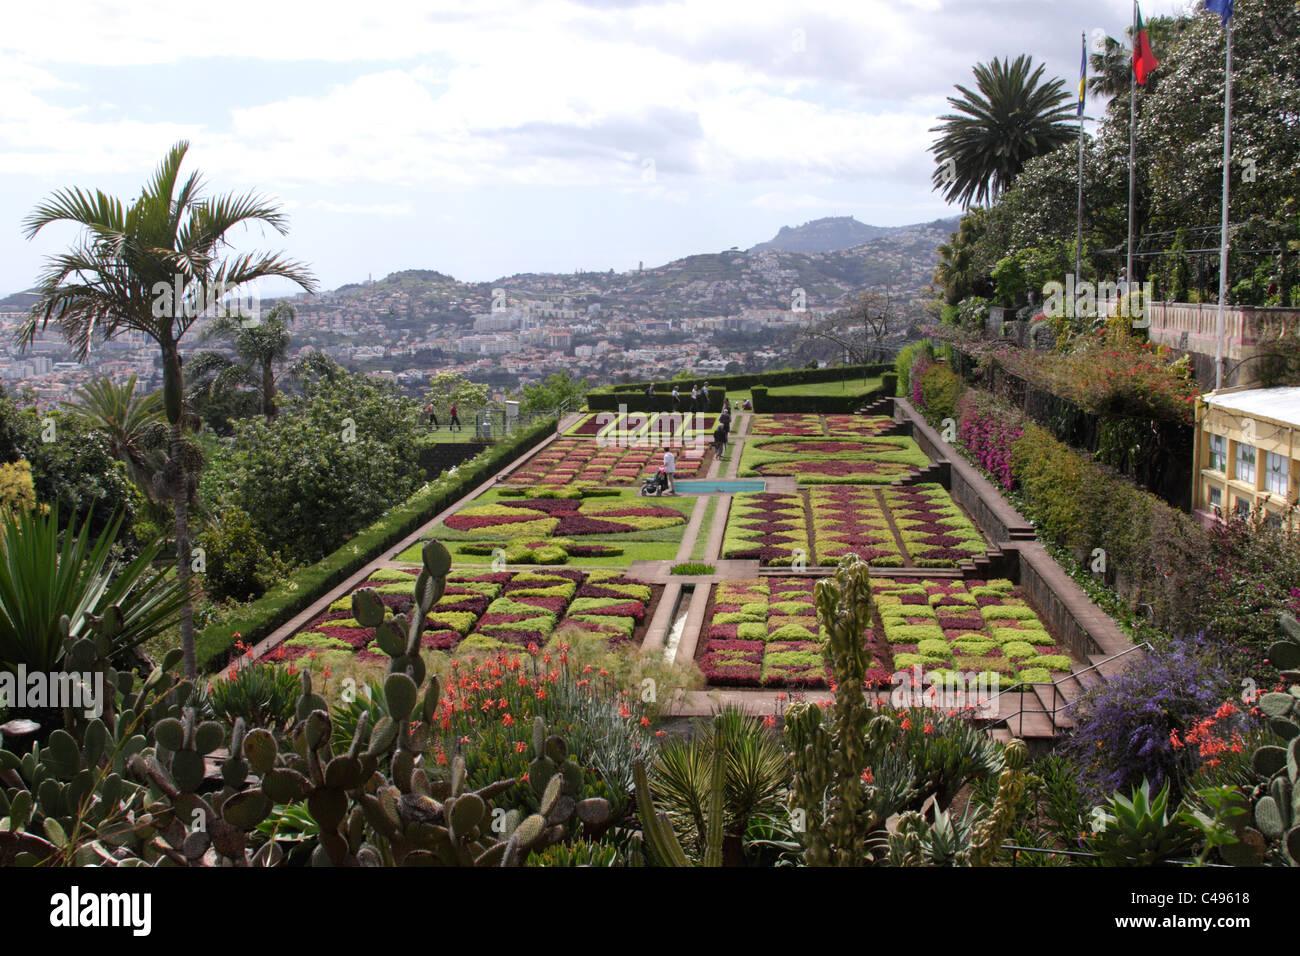 Madeira Botanical Gardens Stock Photos & Madeira Botanical Gardens ...